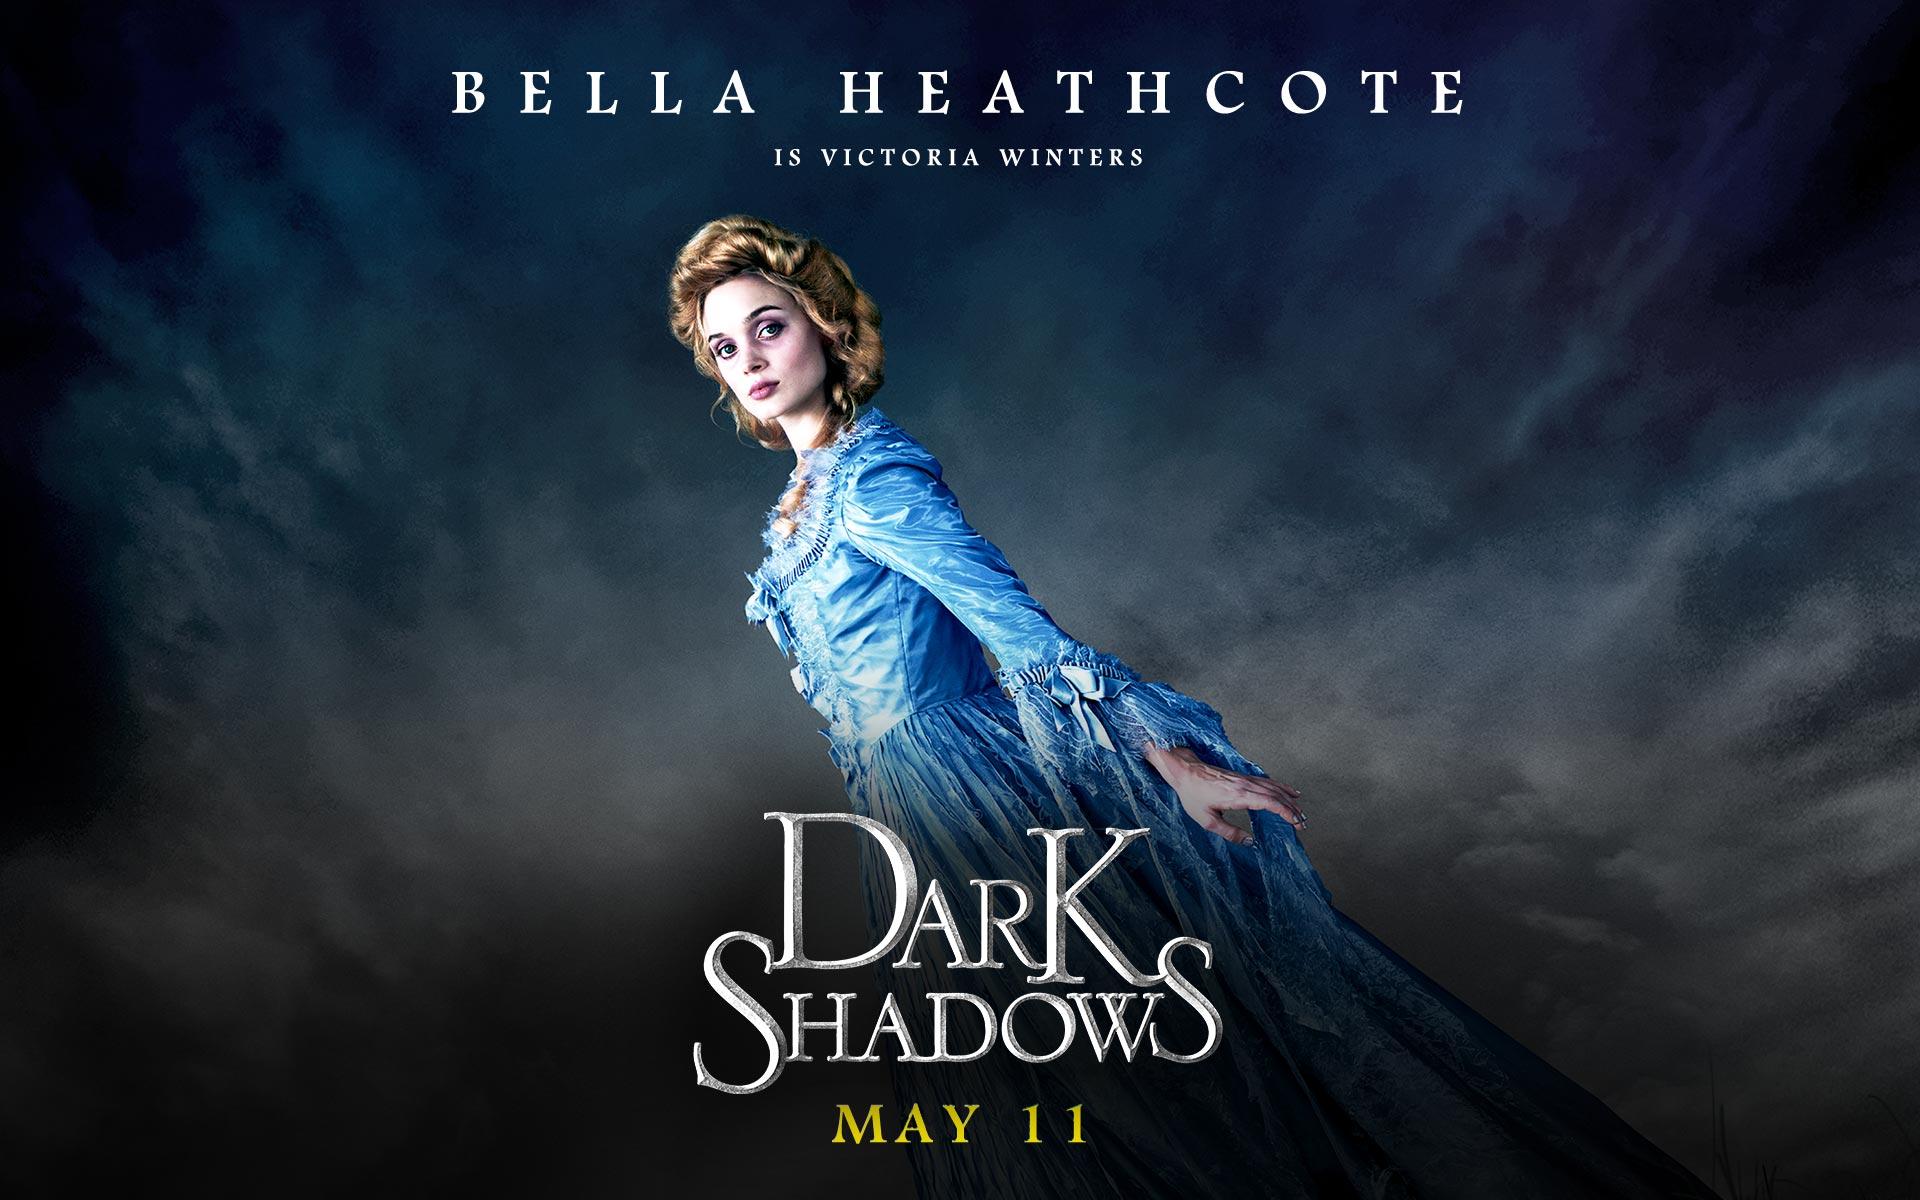 Dark Shadows wallpapers 19201200 Bella Heathcote as Victoria 1920x1200